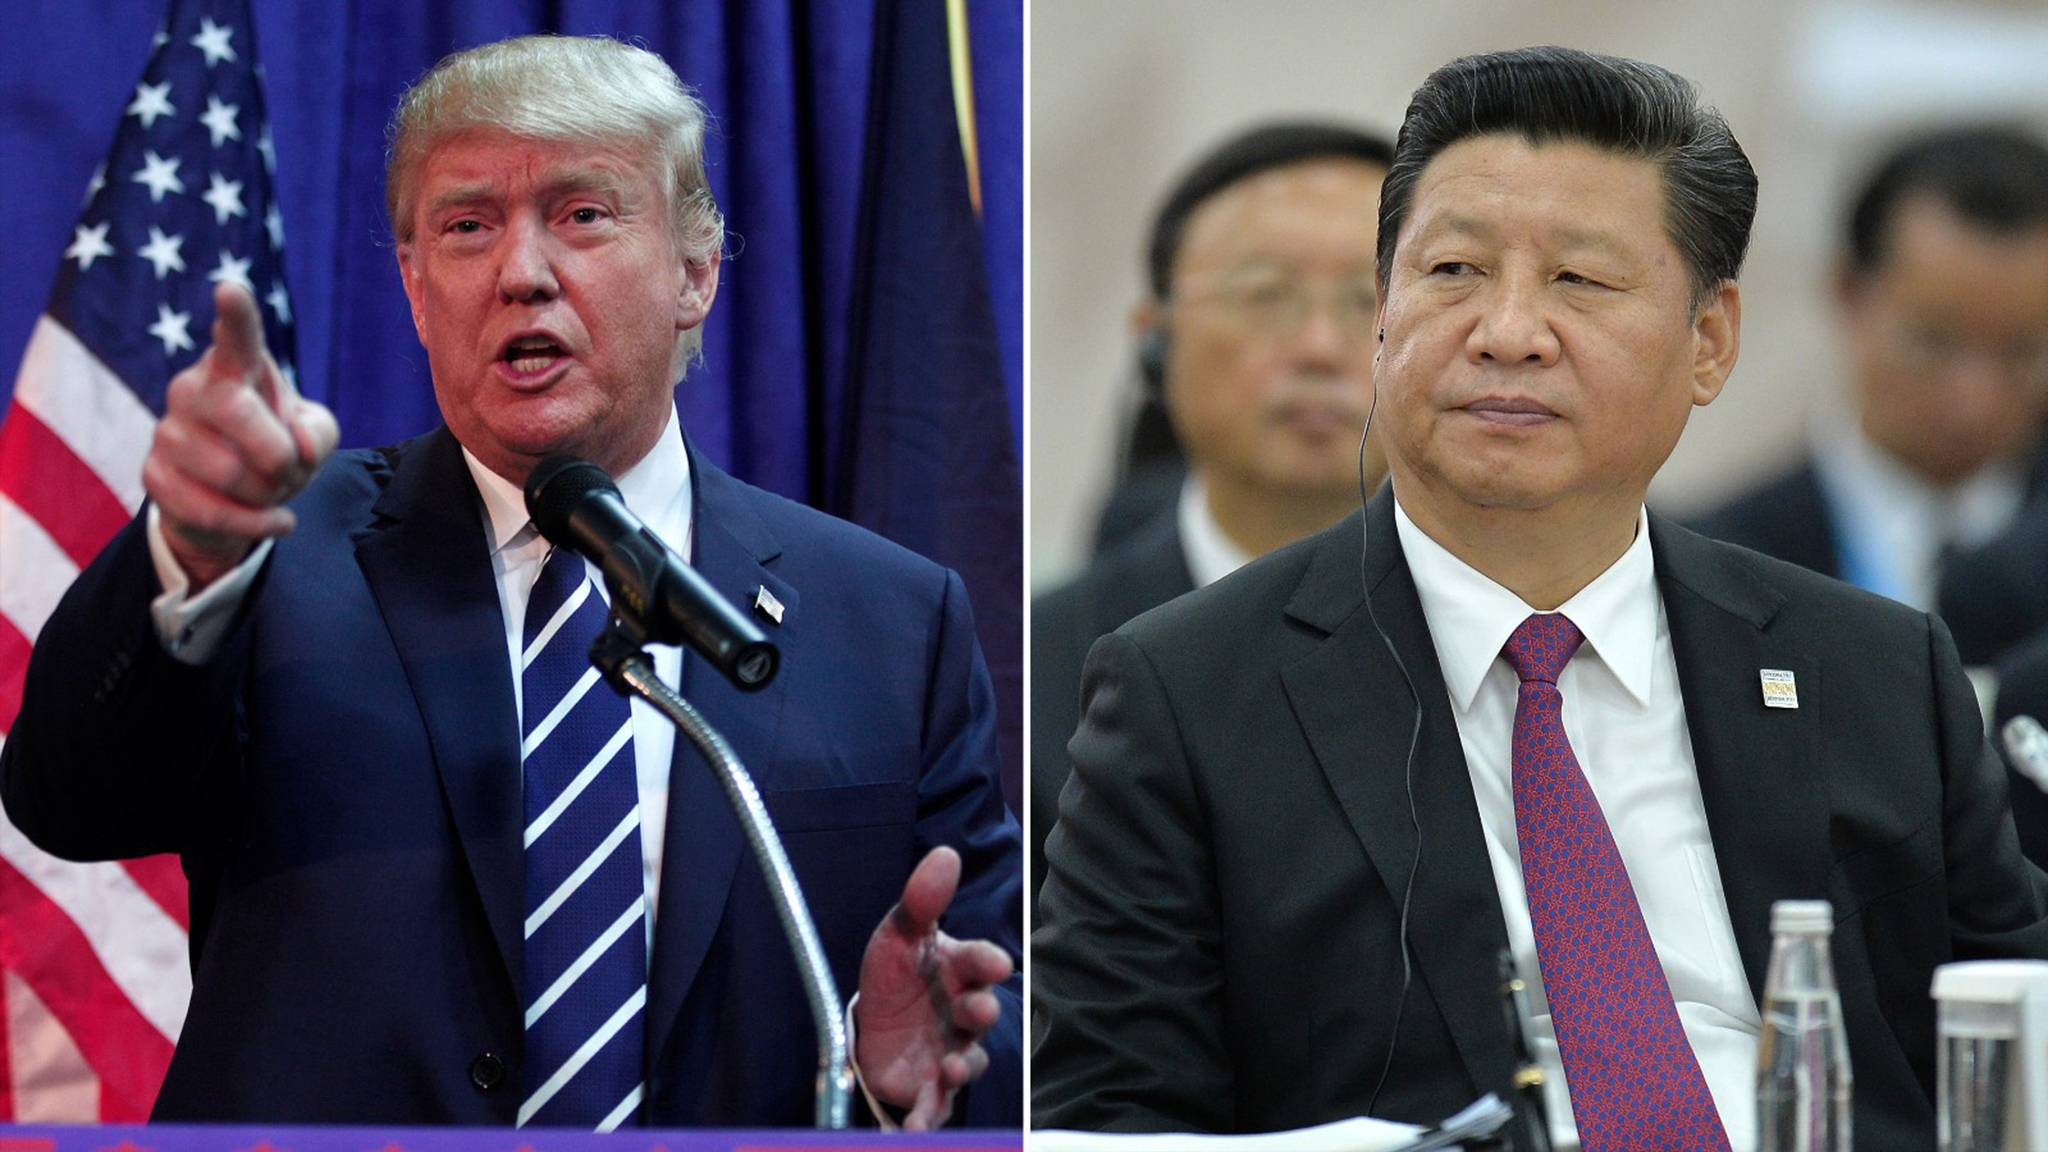 Xi Jinping e Trump reúnem-se num clima de relações dúbias